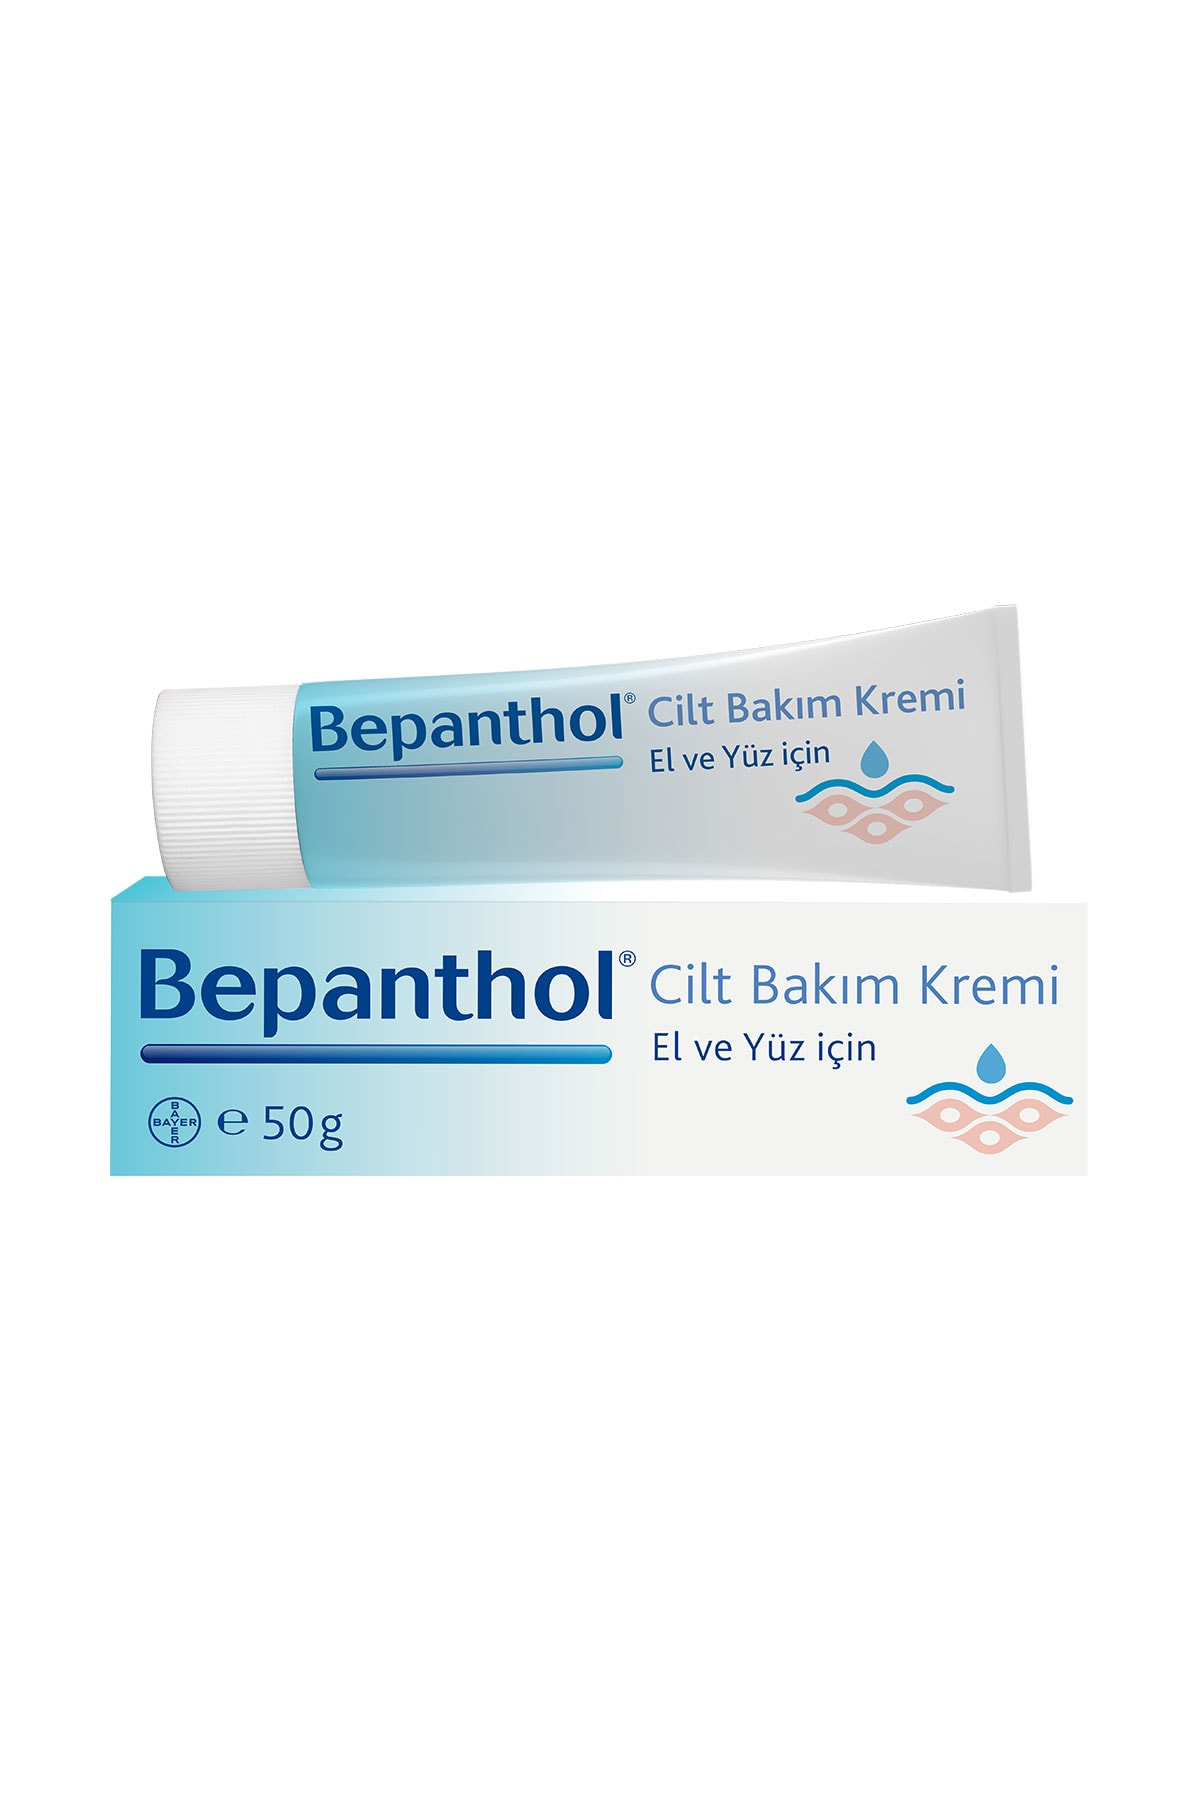 Bepanthol Cilt Bakım Kremi 50 g 8699546358694 2